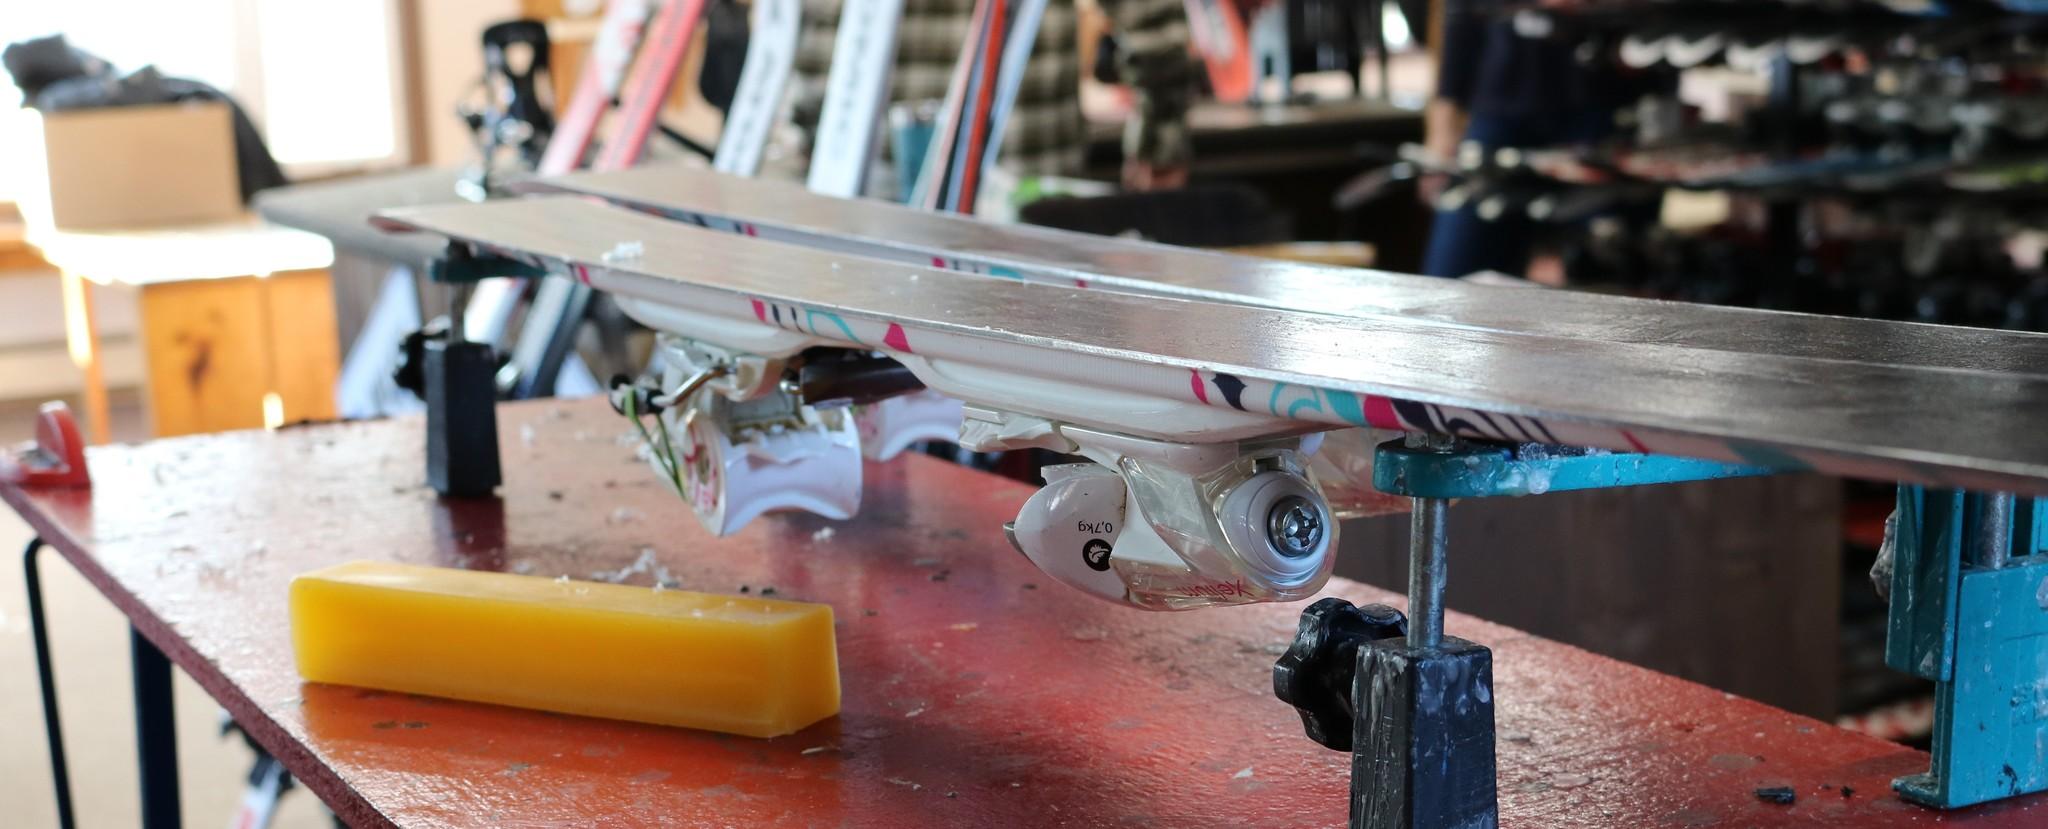 Ski on table with bar of wax